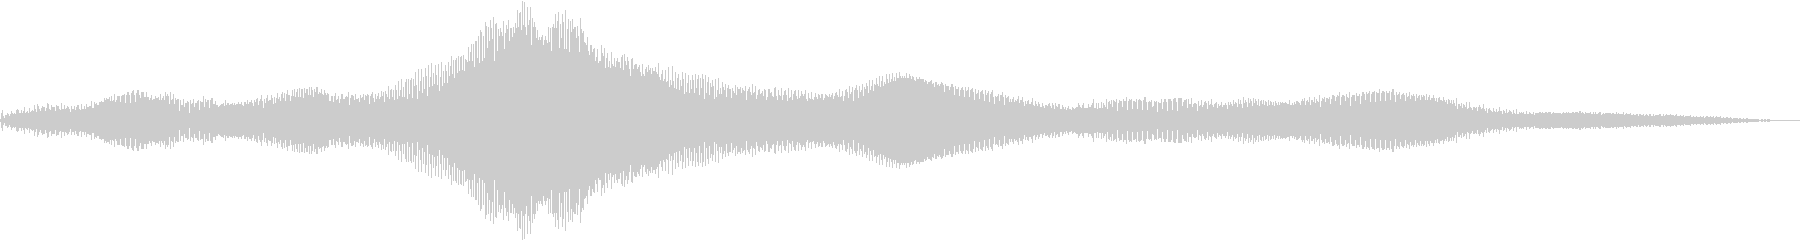 Electron Pad ダーティーの未再生の波形